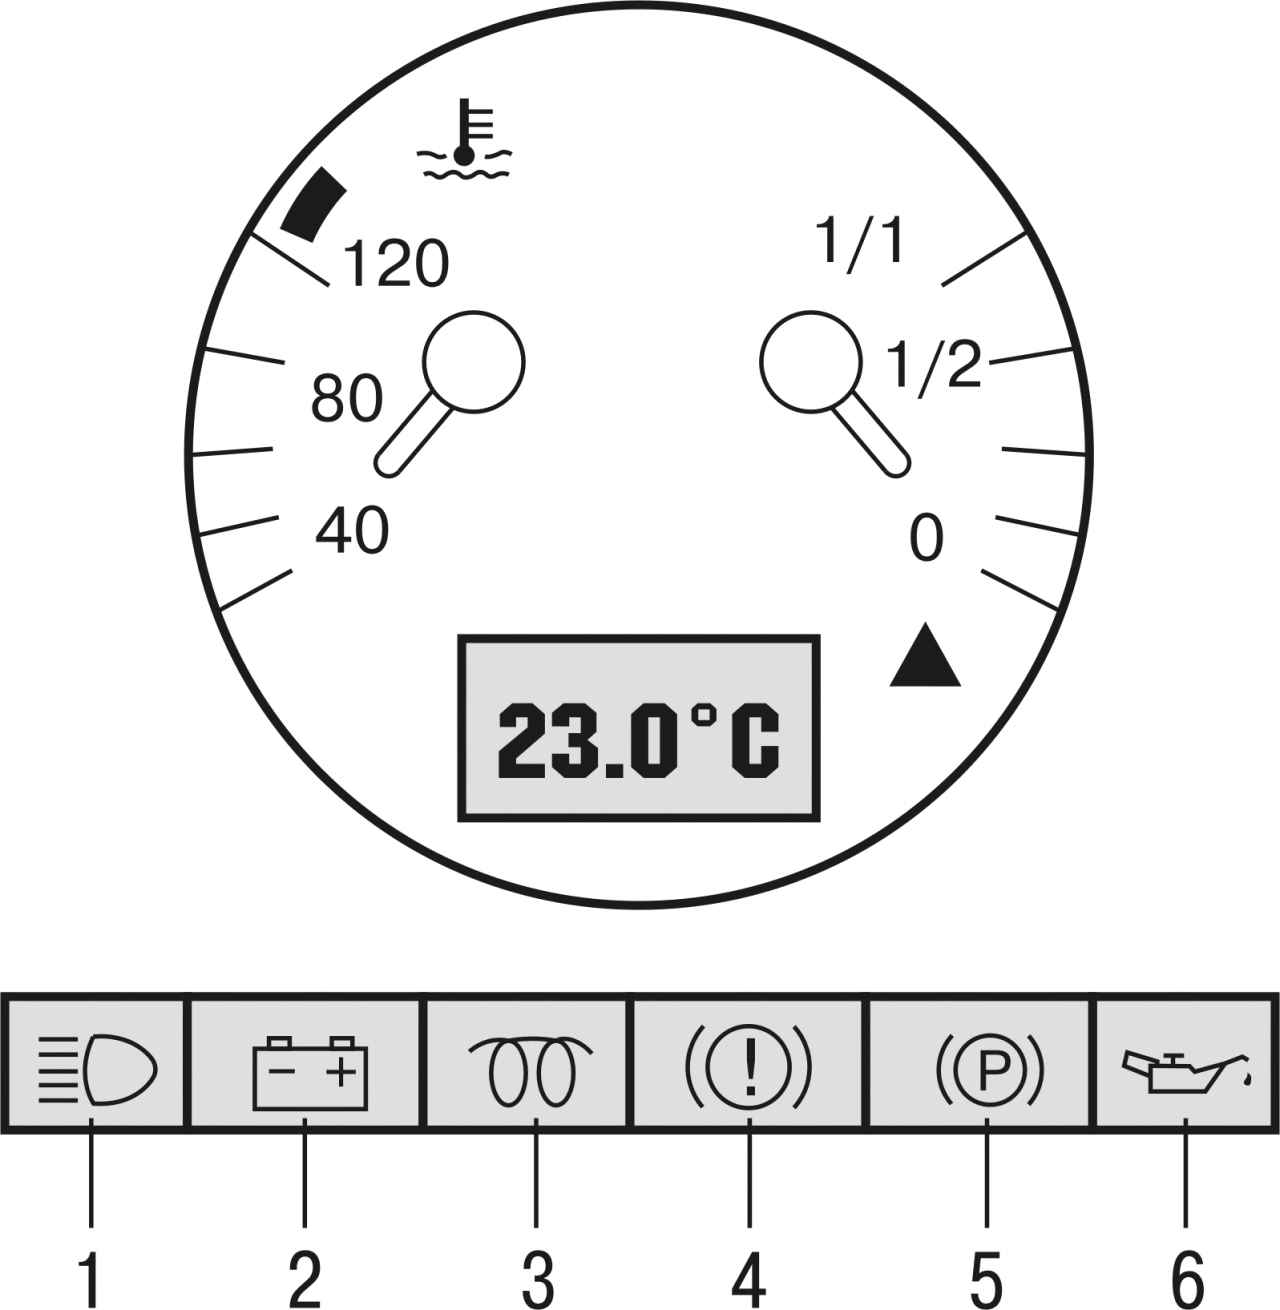 схема проводки уаз-31512 с эпхх